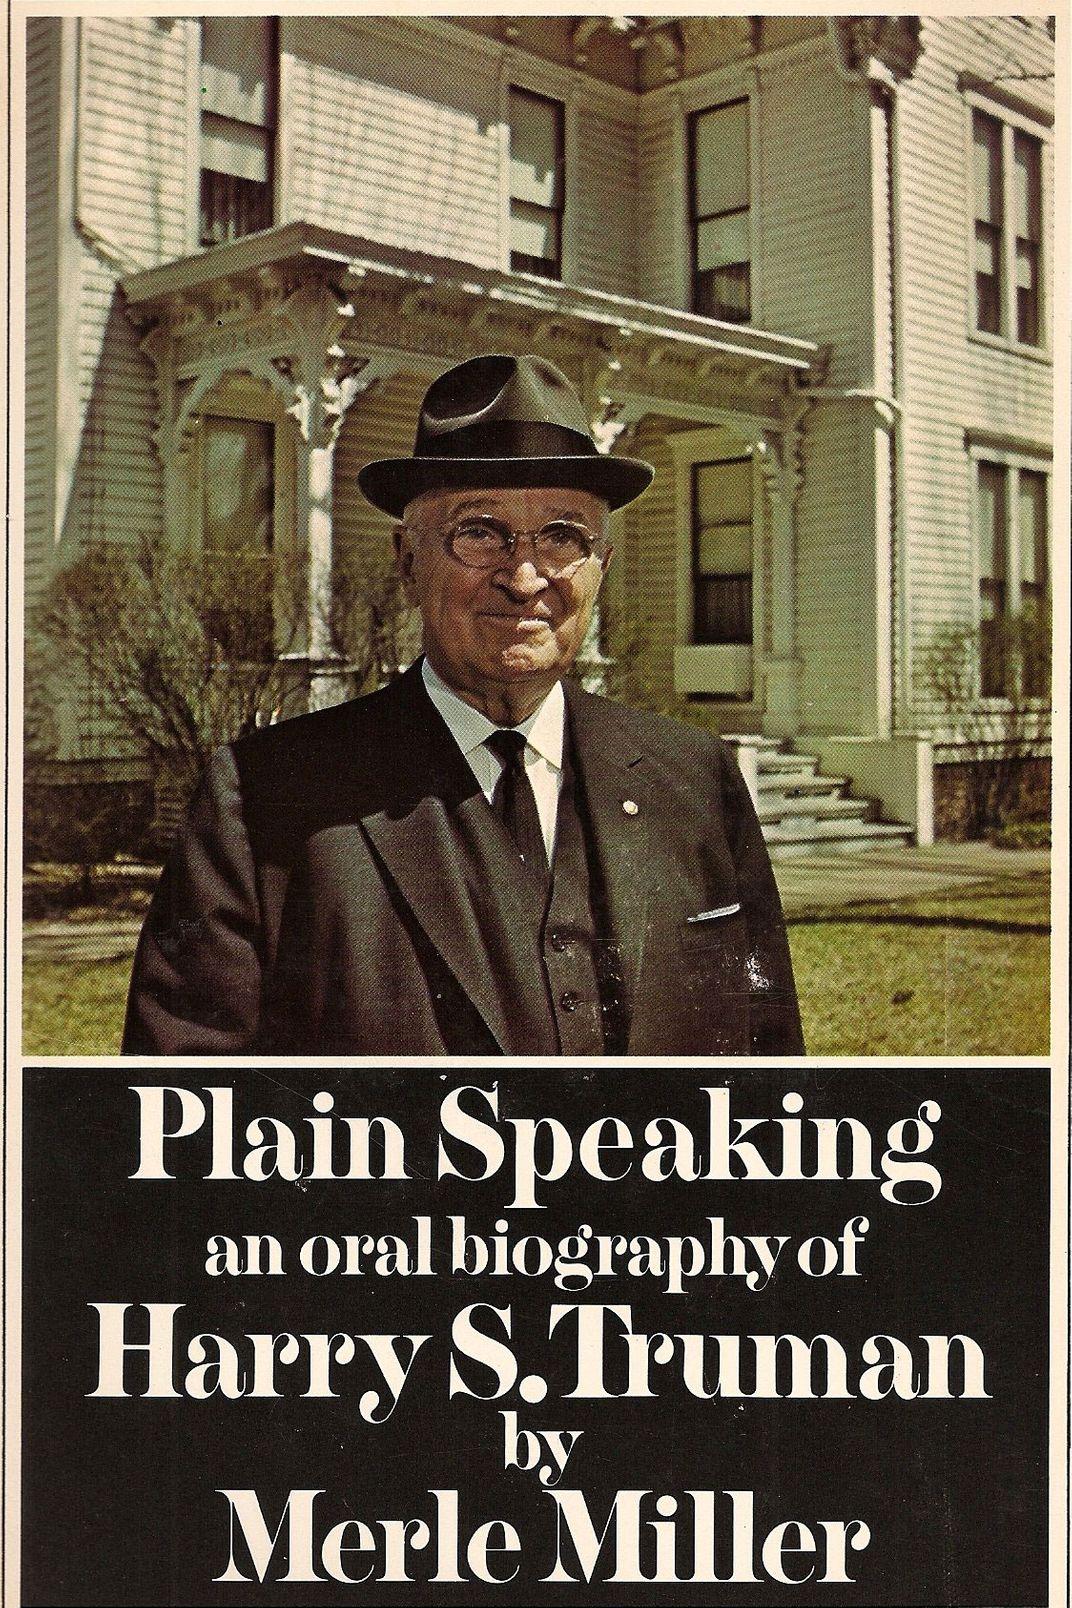 <em>Plain Speaking: An Oral Biography of Harry S. Truman</em> by Merle Miller